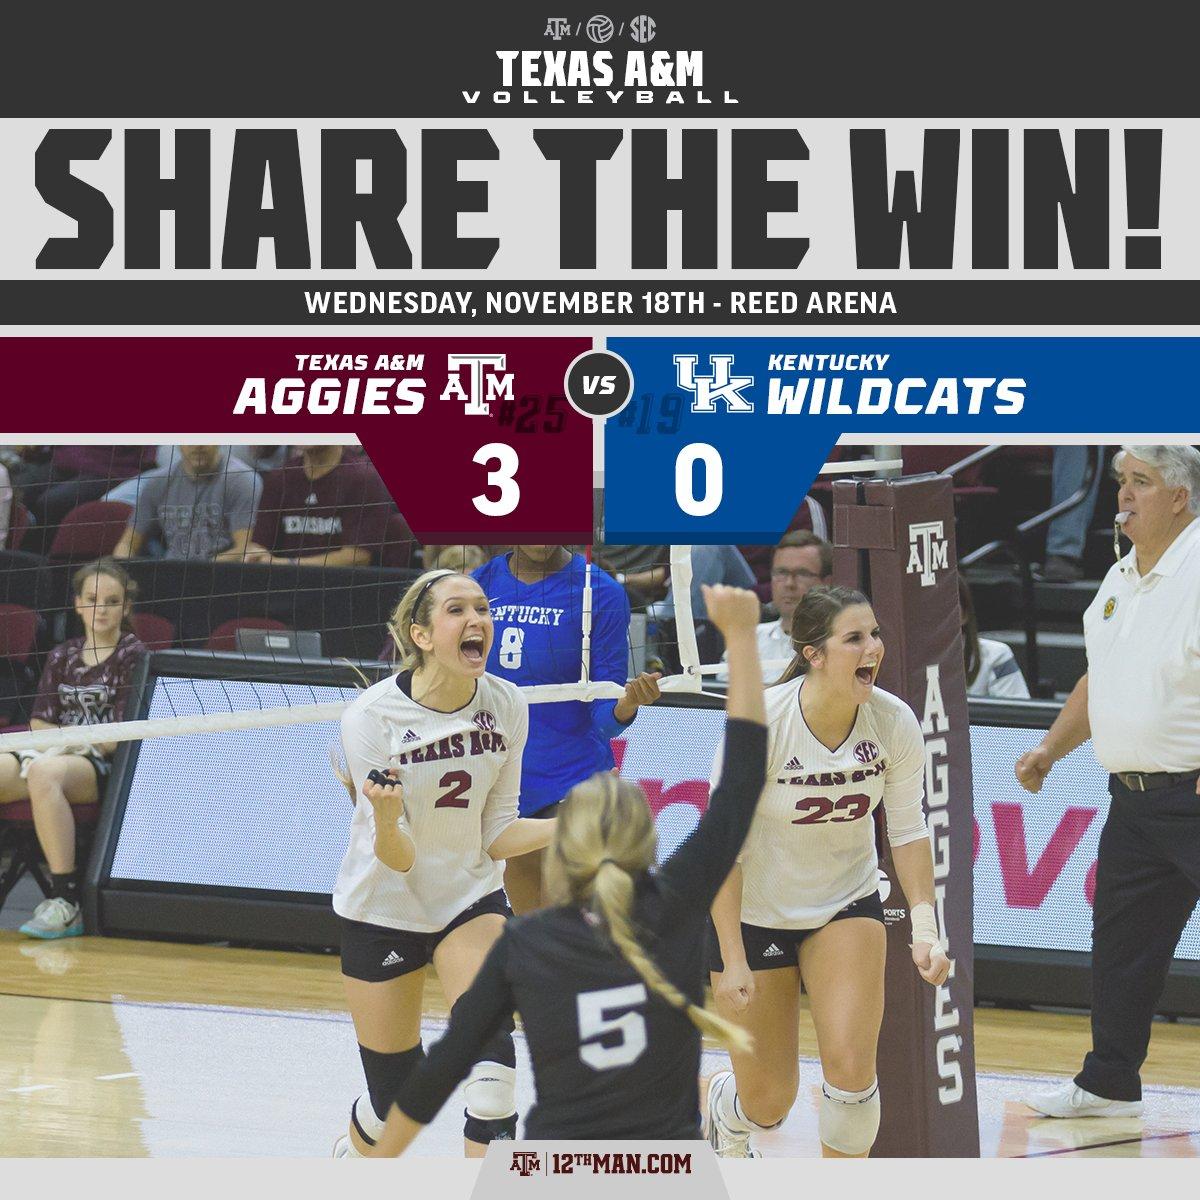 W-W-W-W-W-W-W-W-W-W-W, that's 11 straight wins for your Fighting Texas Aggies! #12thMan #RTtheWIN https://t.co/t4Dbo08N6b